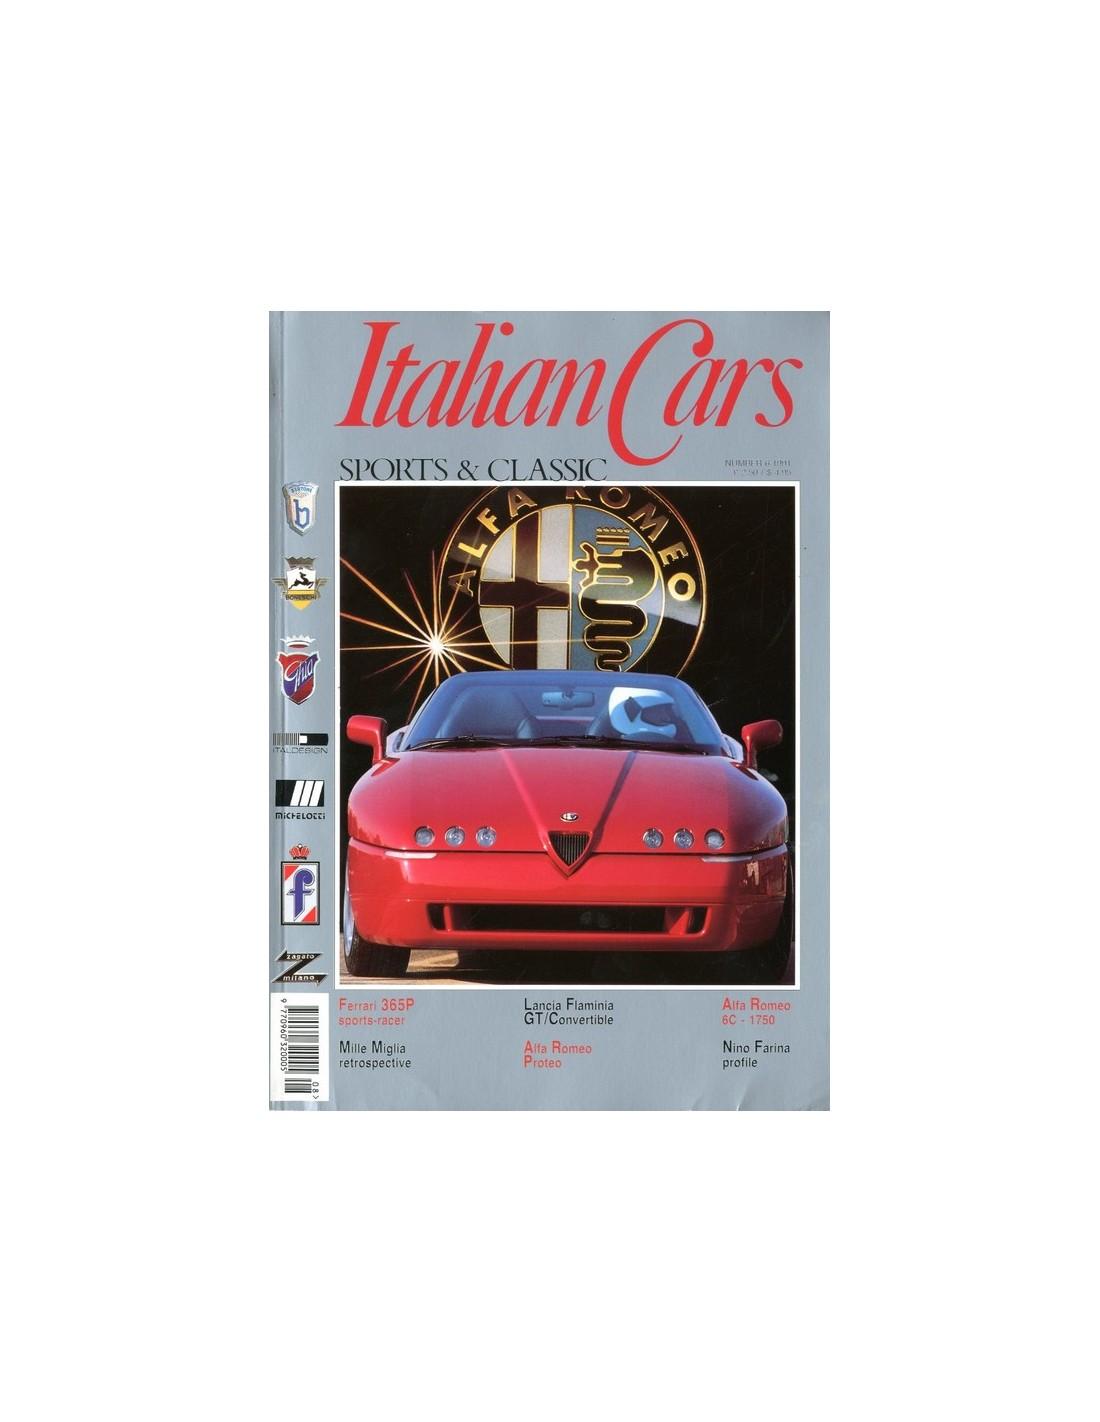 1991 ITALIAN CAR SPORTS & CLASSIC MAGAZINE ENGLISH 6